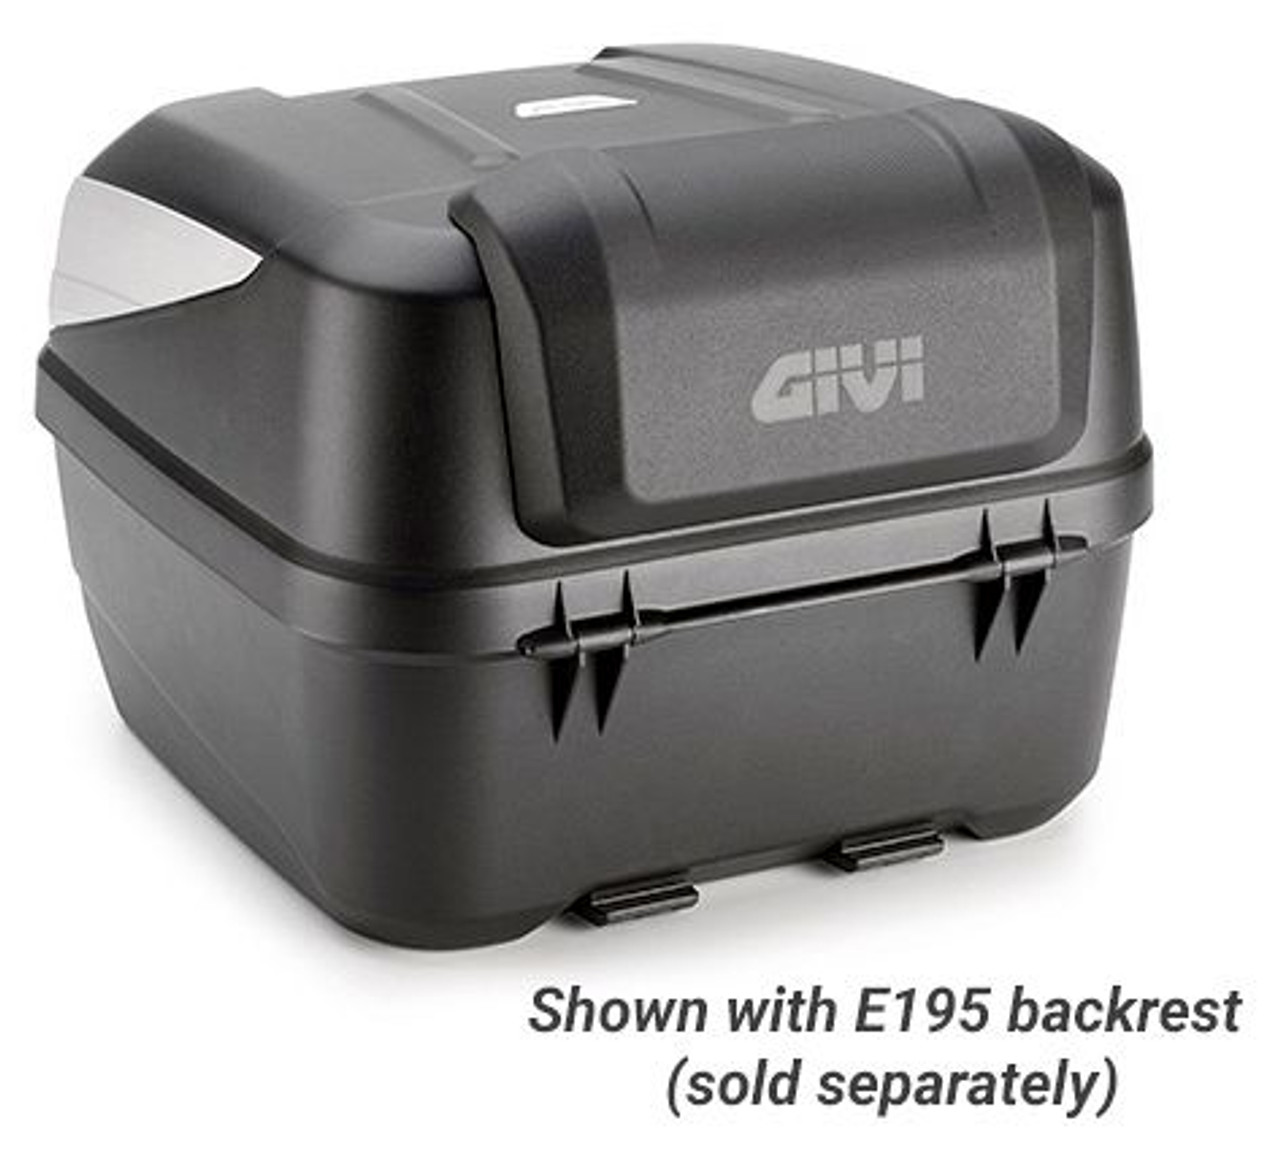 B32 GIVI Backrest for Monolock Top Box Bold